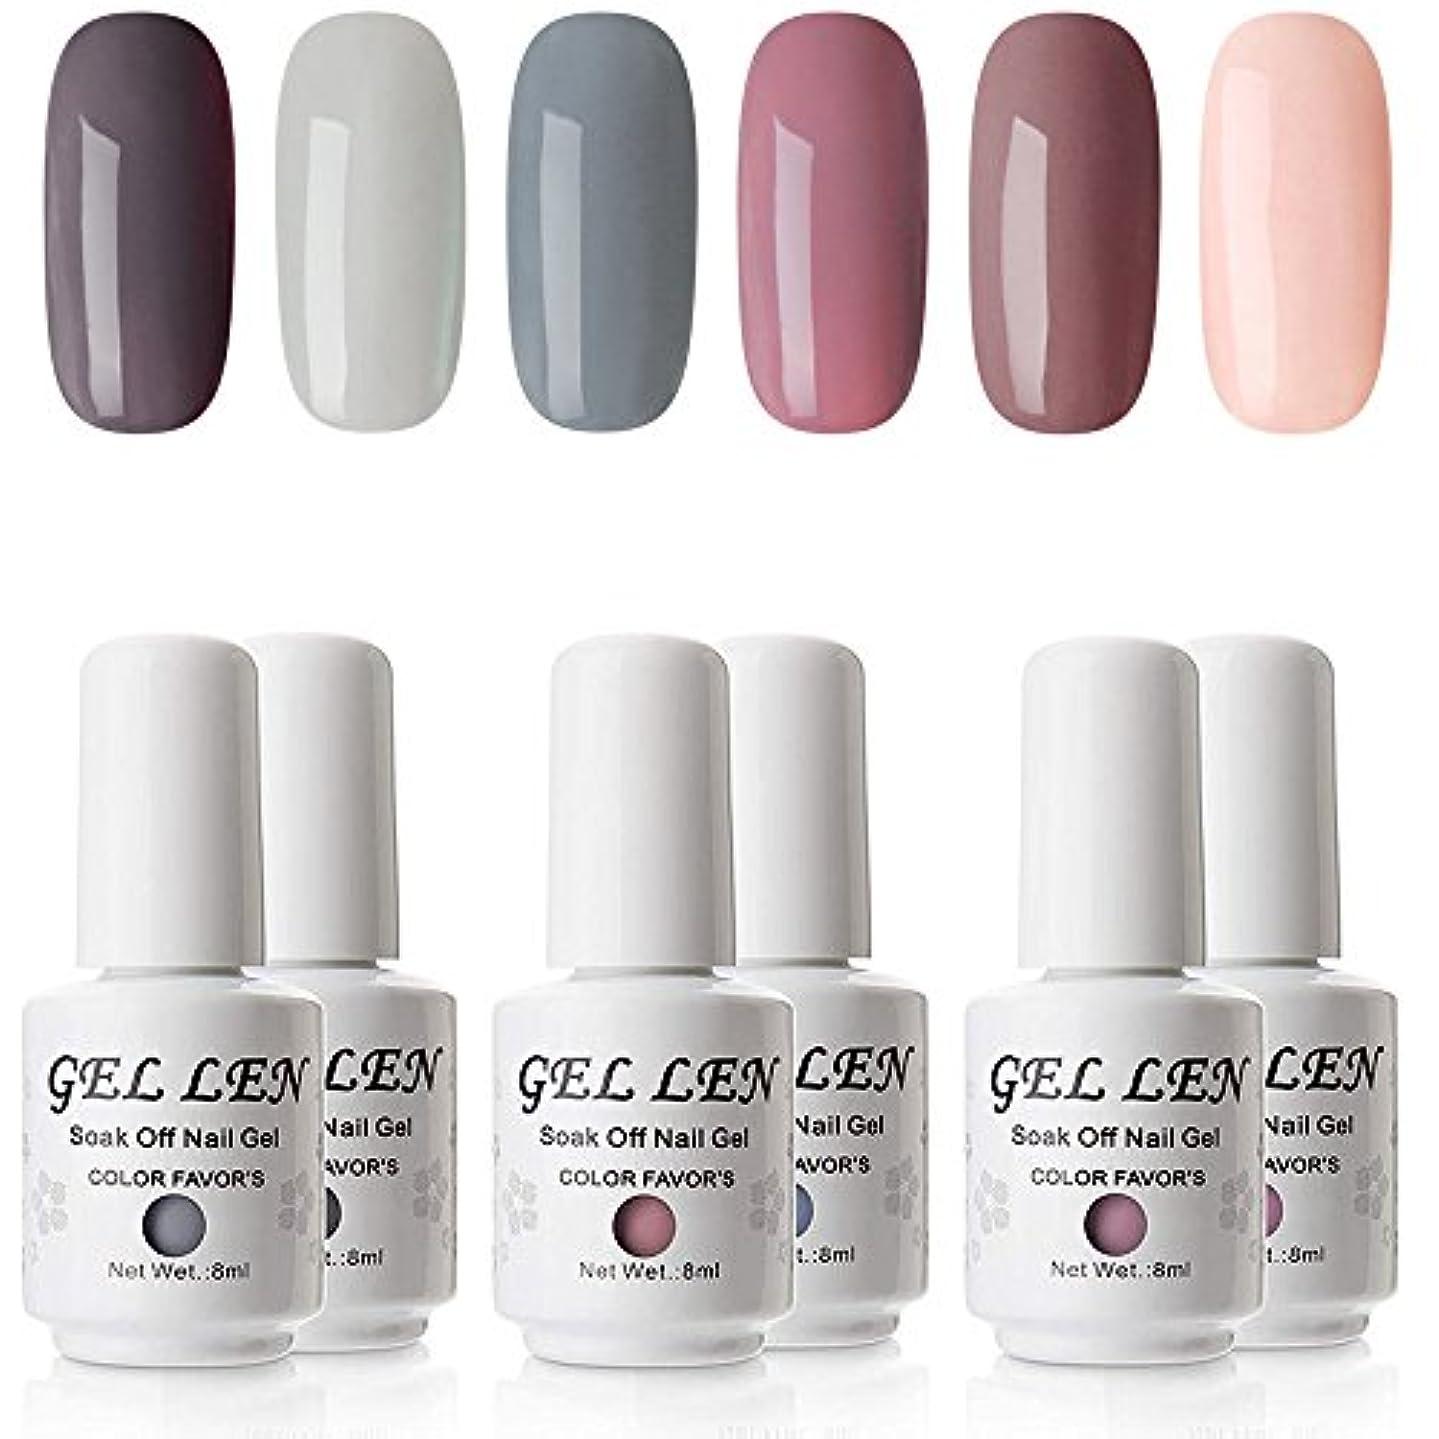 Gellen Gel Polish Set - Nude Gray Series 6 Colors Nail Art Gift Box, Soak Off UV LED Nail Gel Kit 8ml